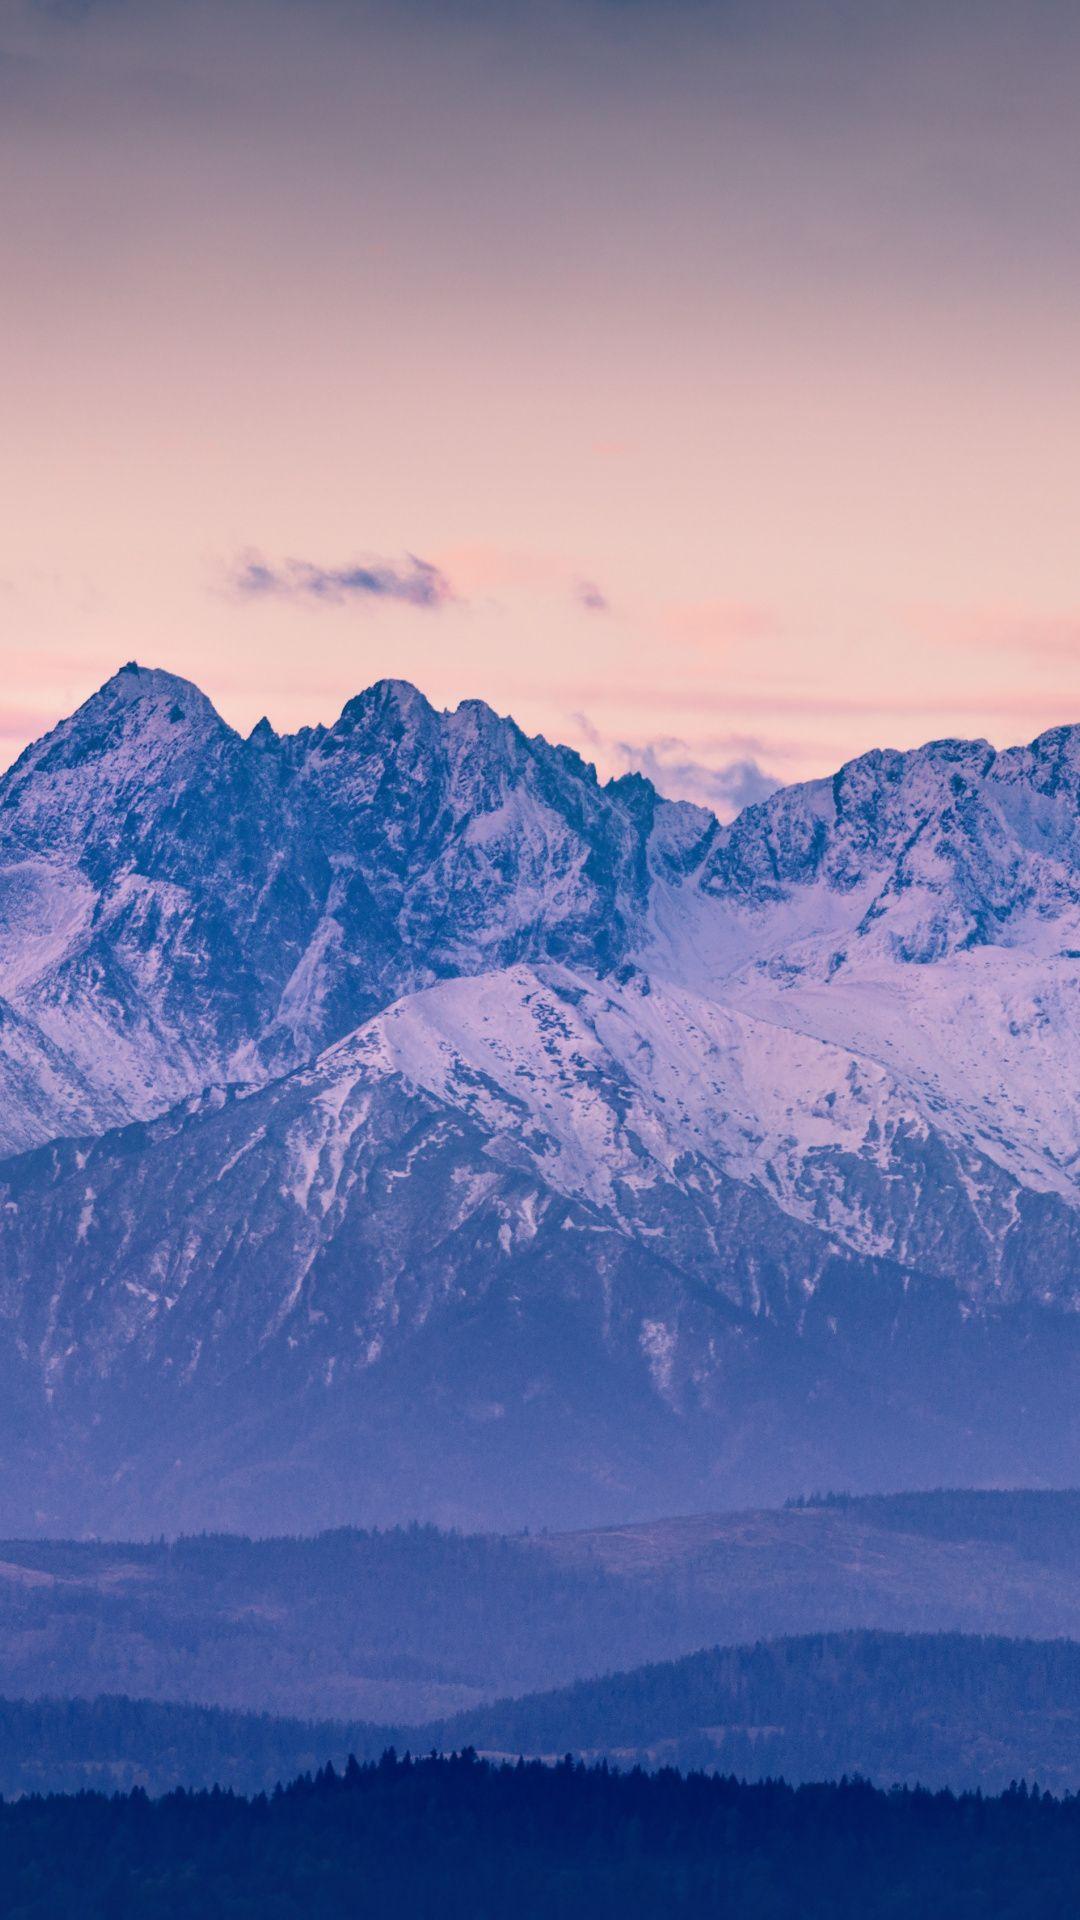 Sunrise, beautiful, mountains, nature wallpaper Nature